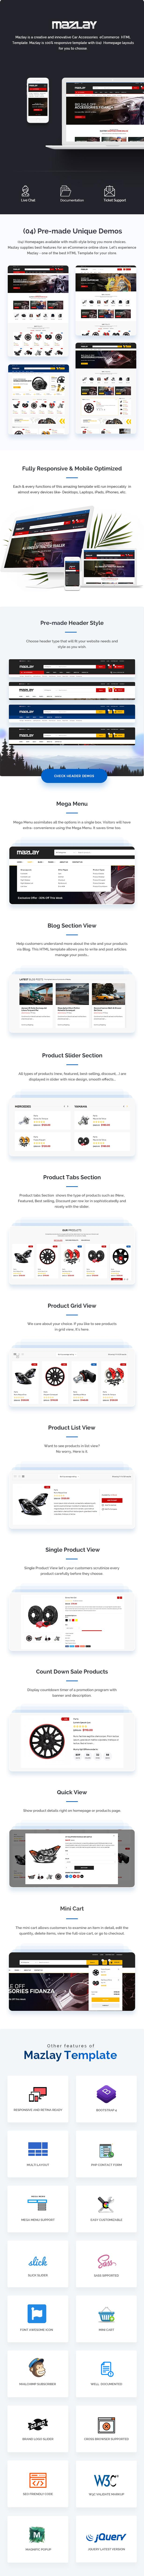 Mazlay - Car Accessories Shop HTML Template - 1